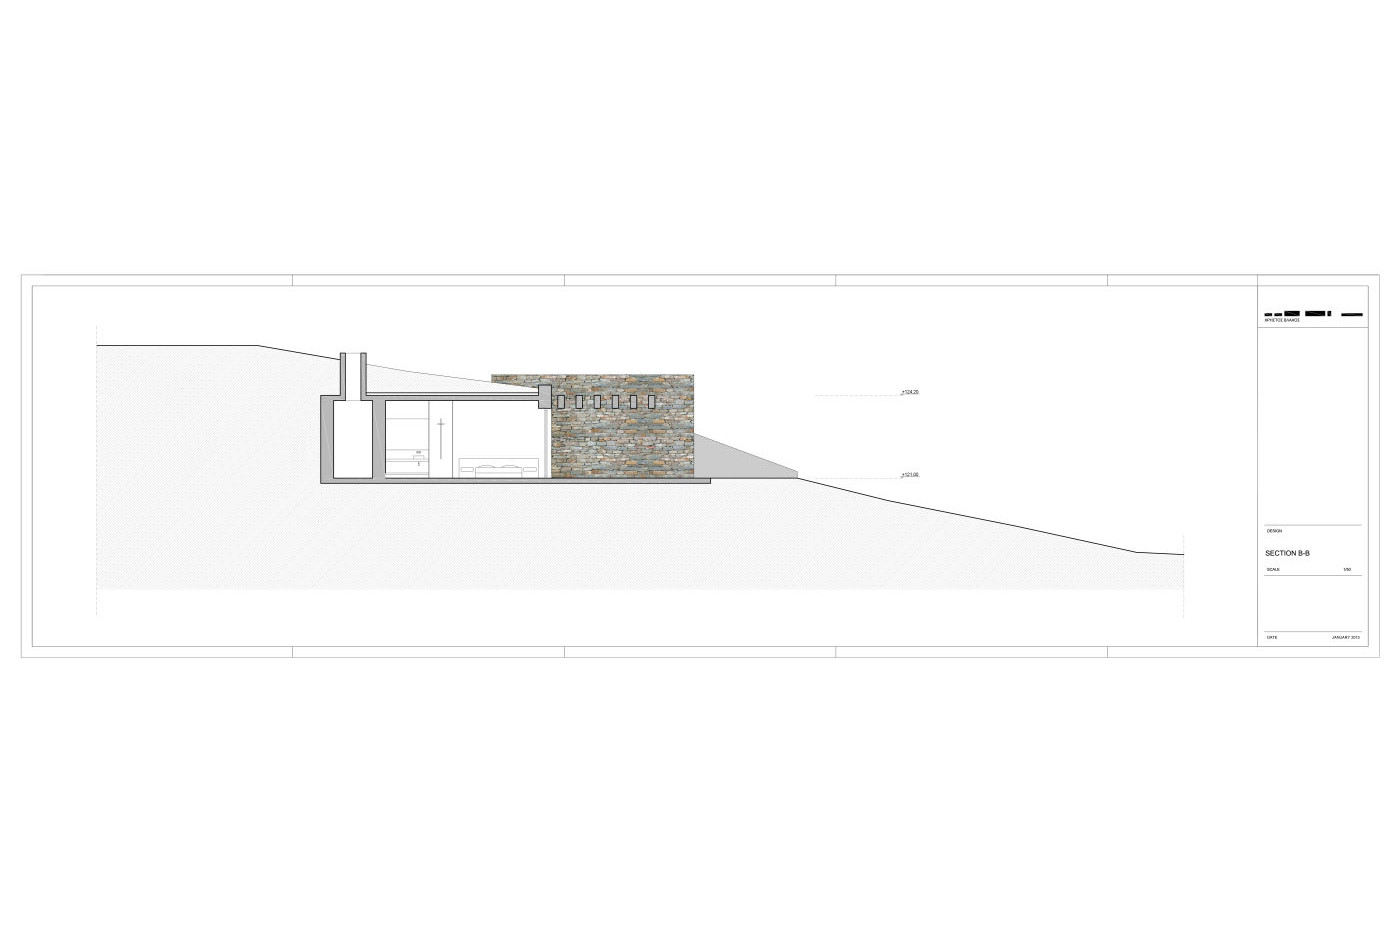 016-villa-a-section-b-1400x990.jpg